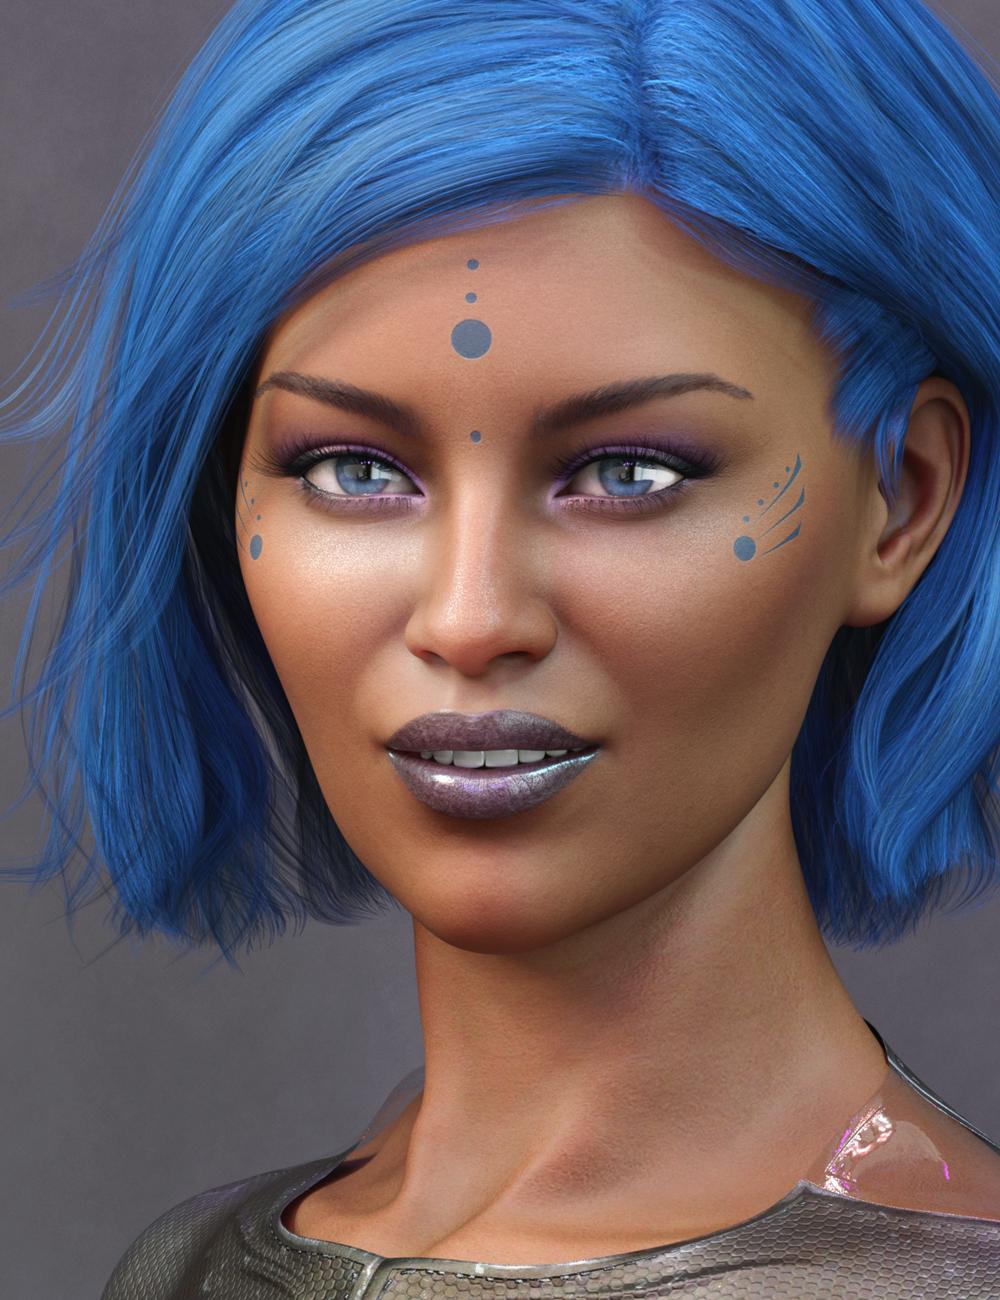 Anika HD for Alawa 8 by: Emrys, 3D Models by Daz 3D